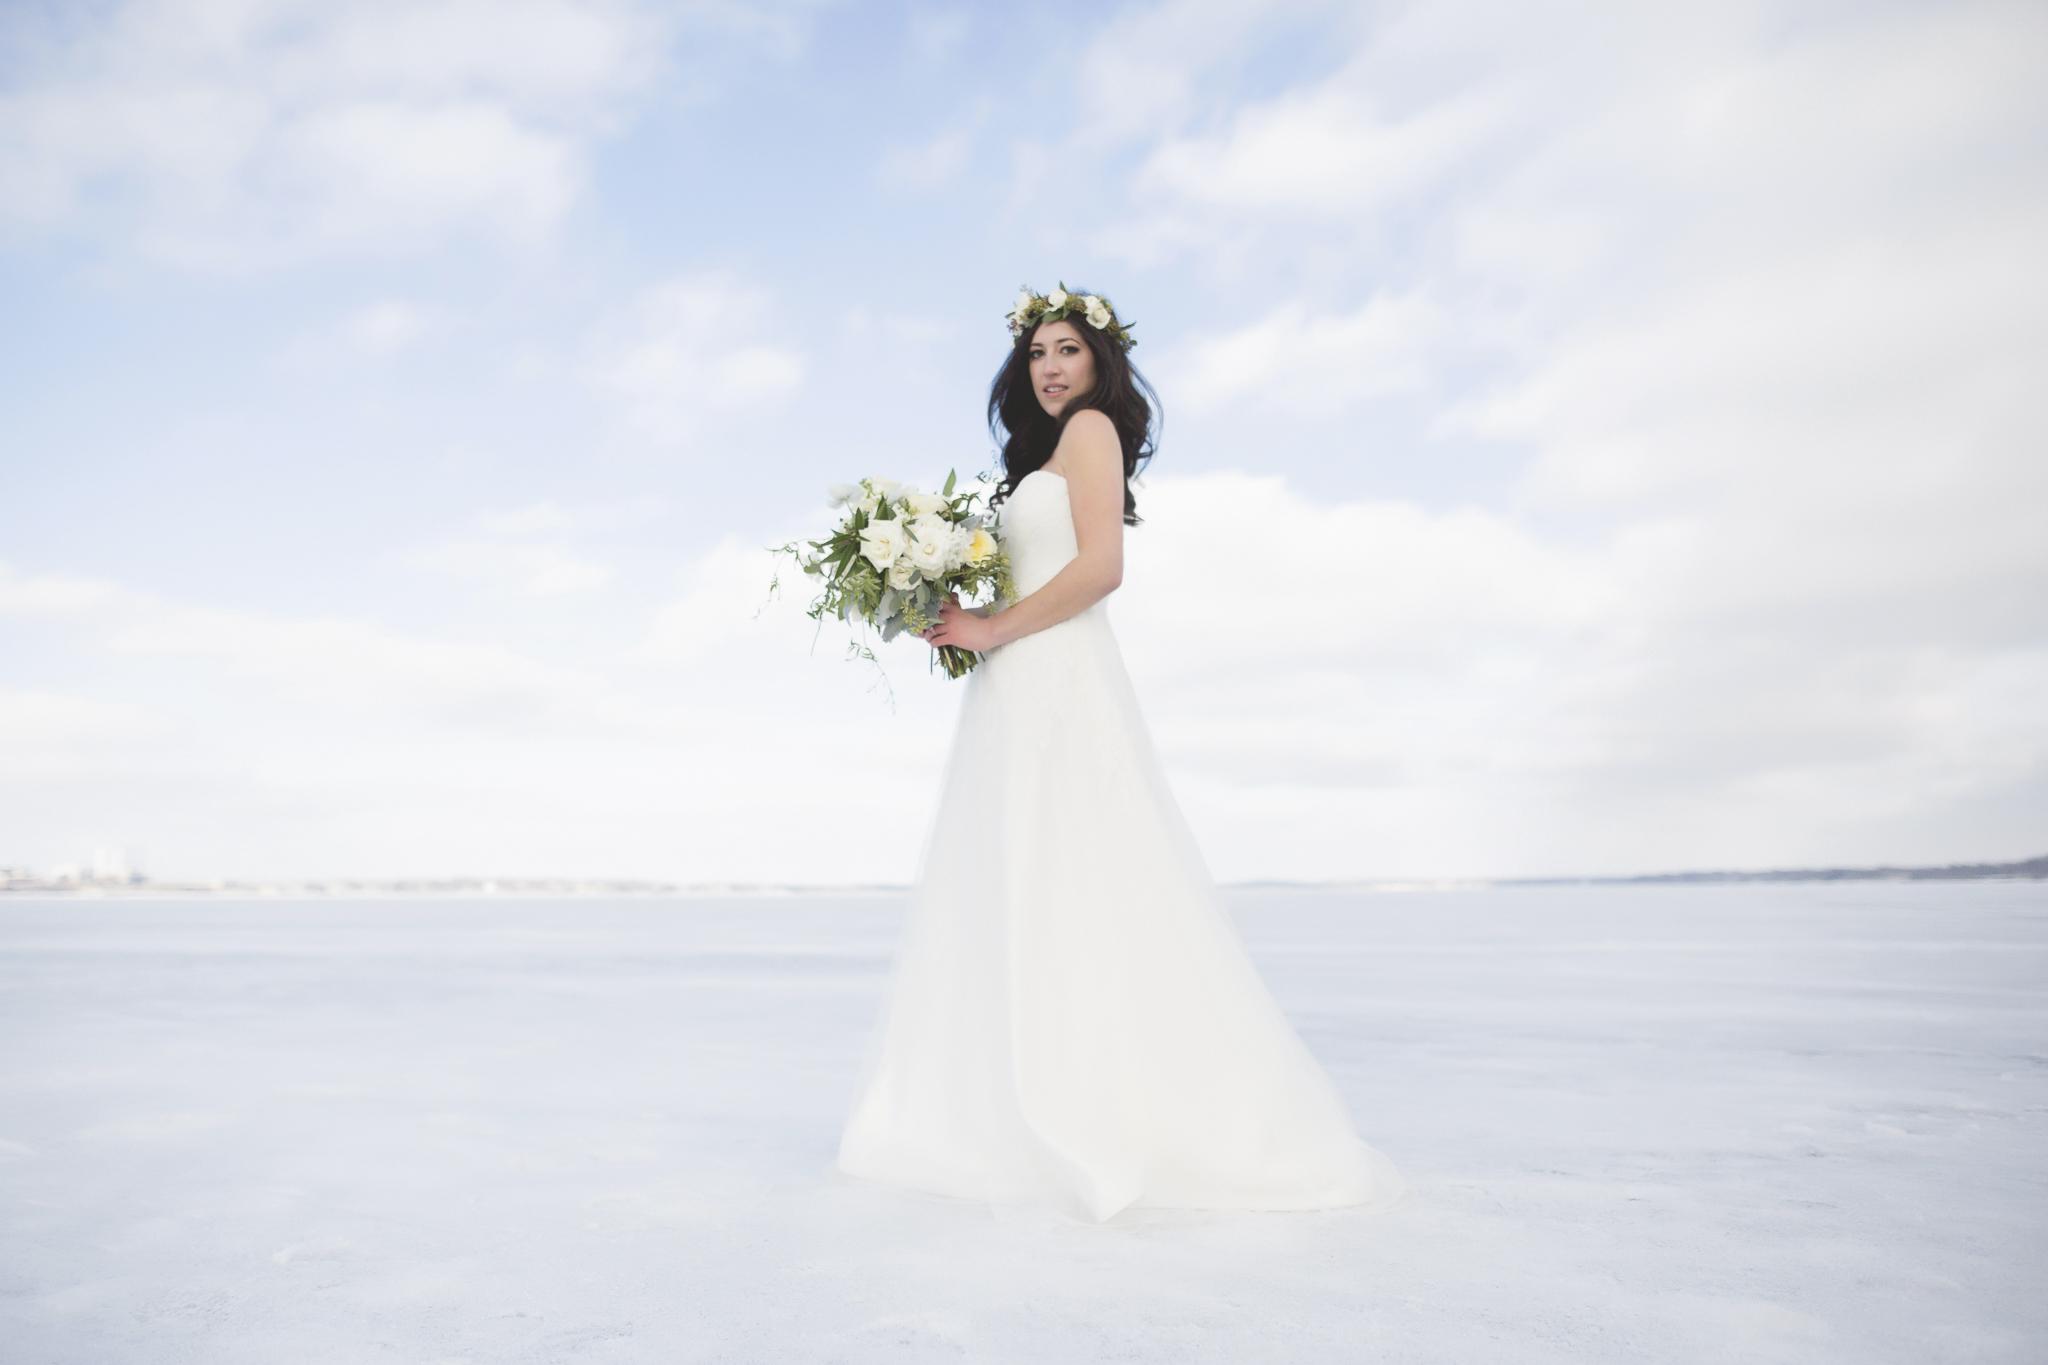 minneapolis winter wedding photographer-15.jpg